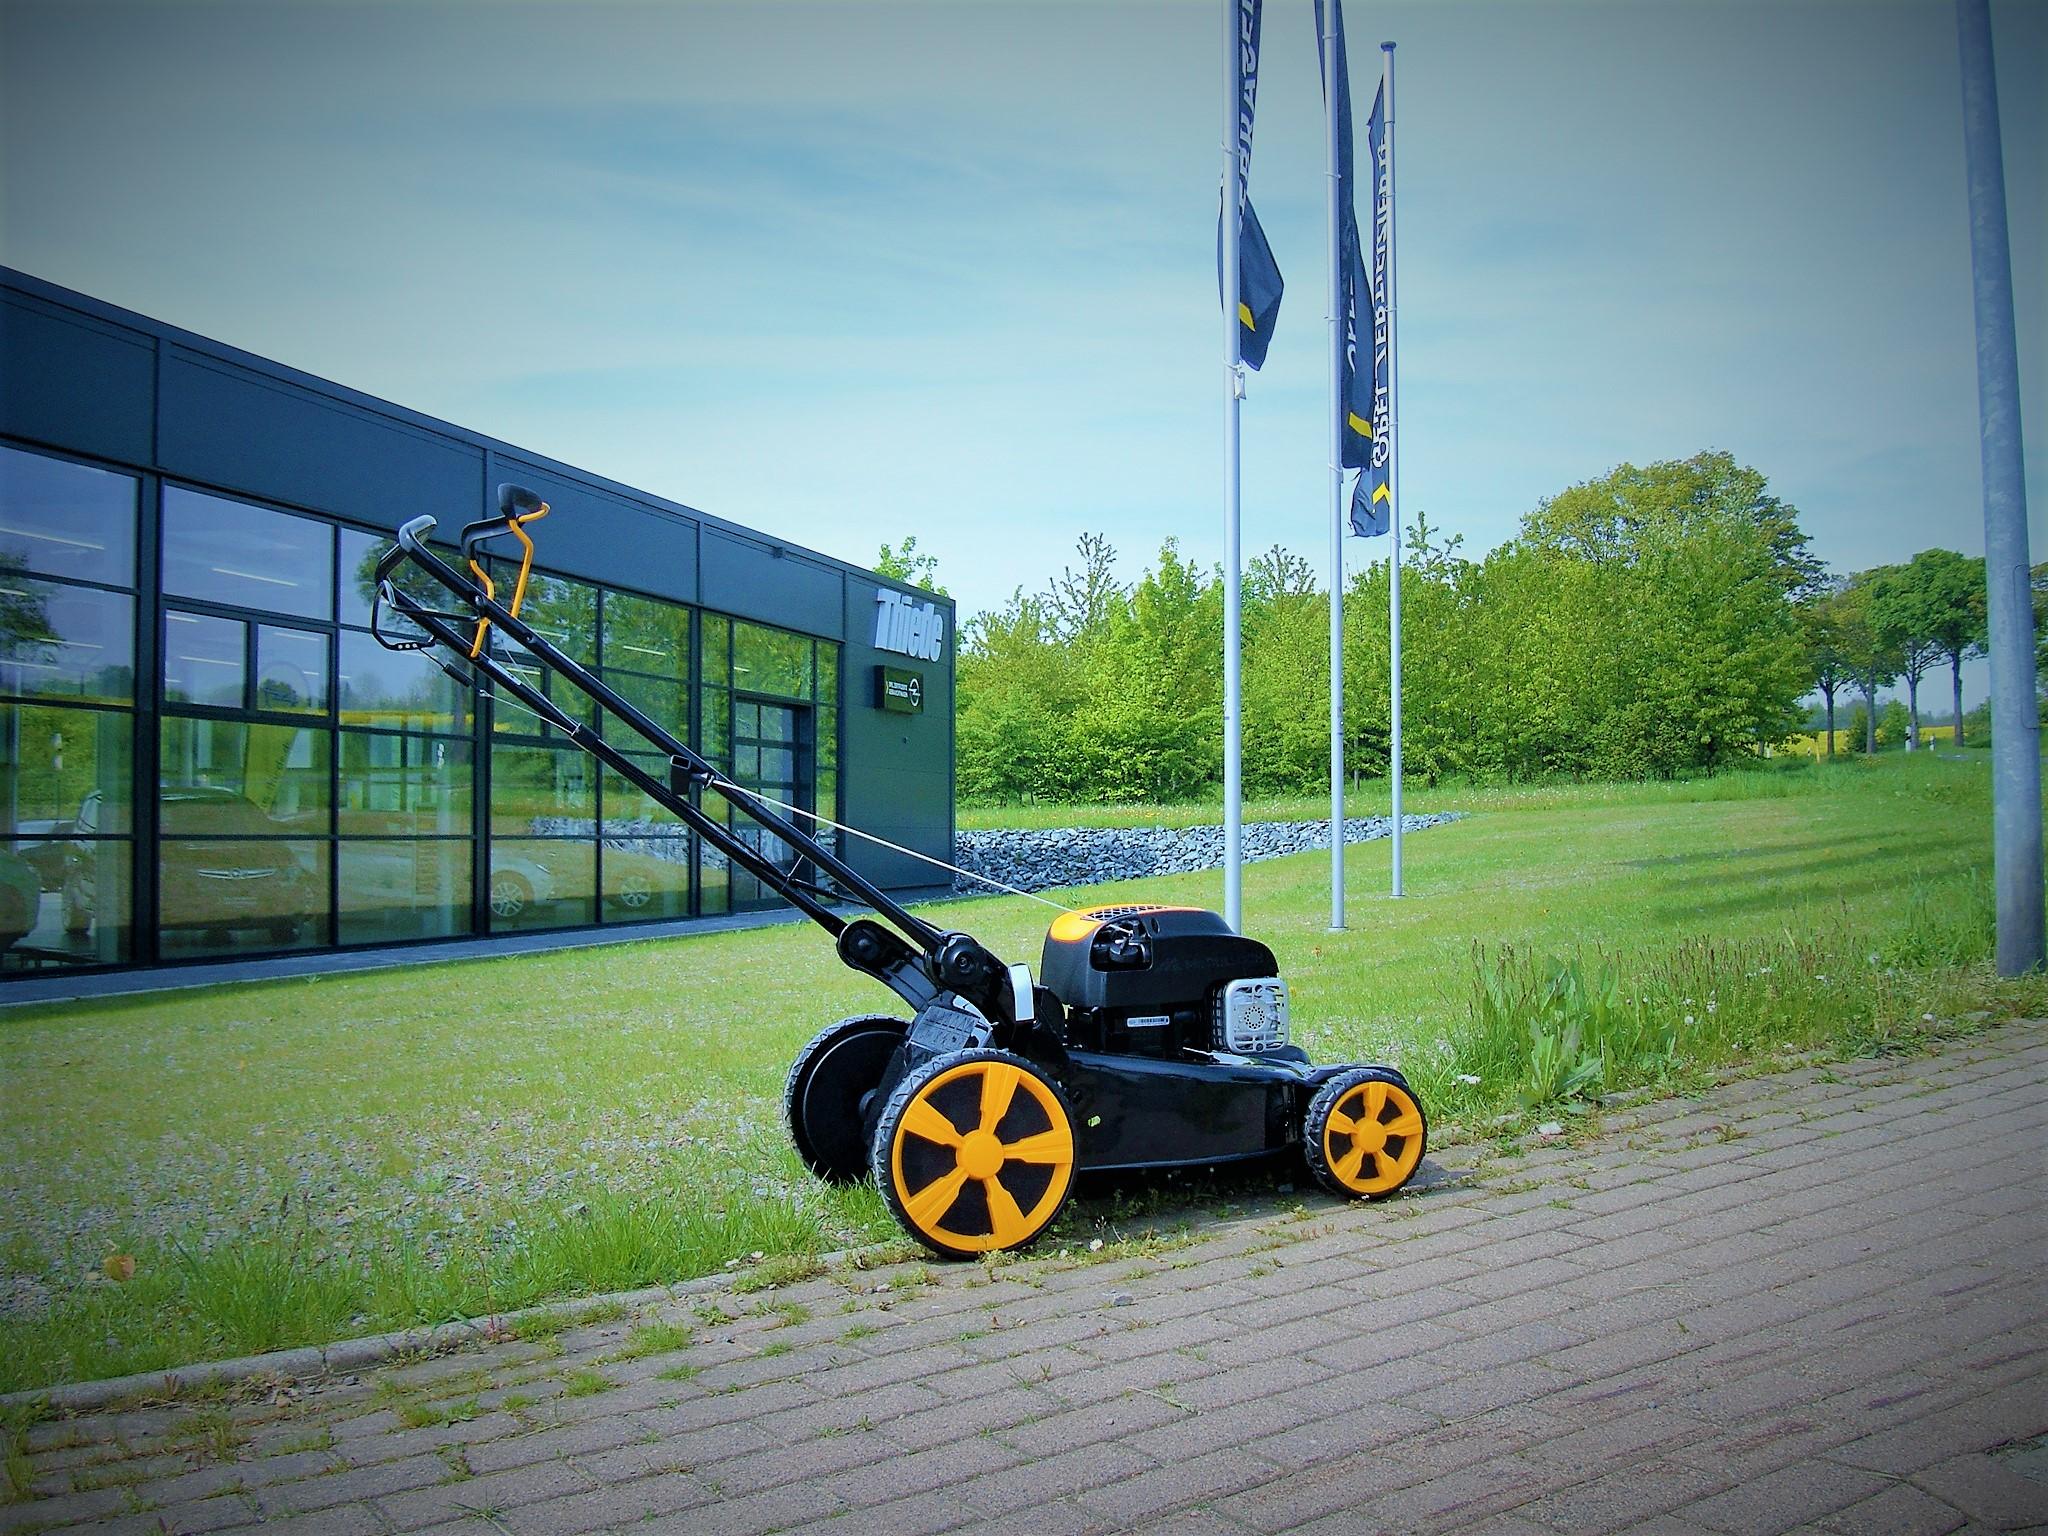 Rasenmäher Am Galgenberg bringt den richtigen Schnitt ins Gras